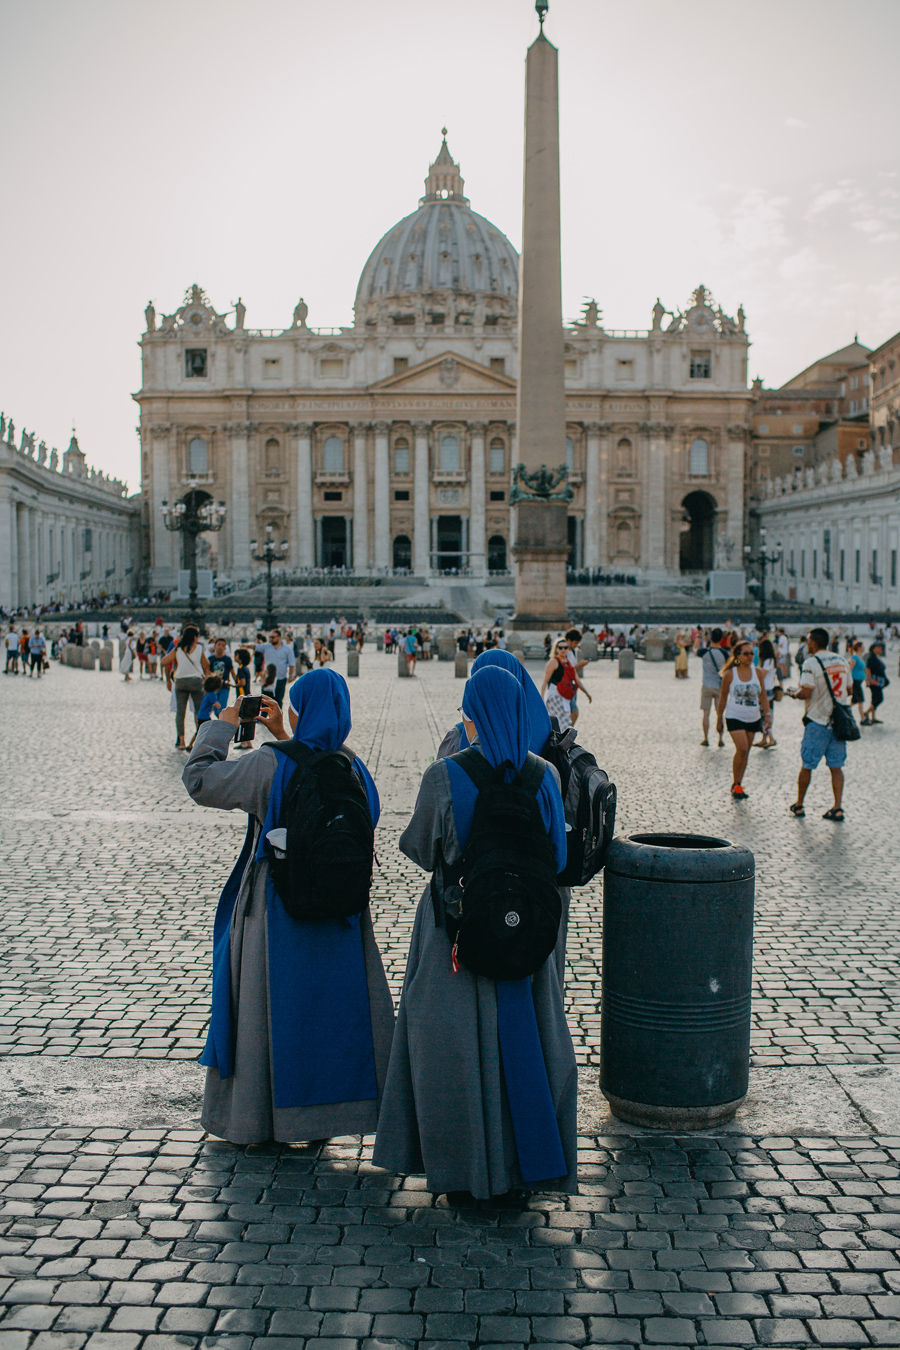 041-italy-rome-civita-orvieto-castle-italia-travel-photography.jpg